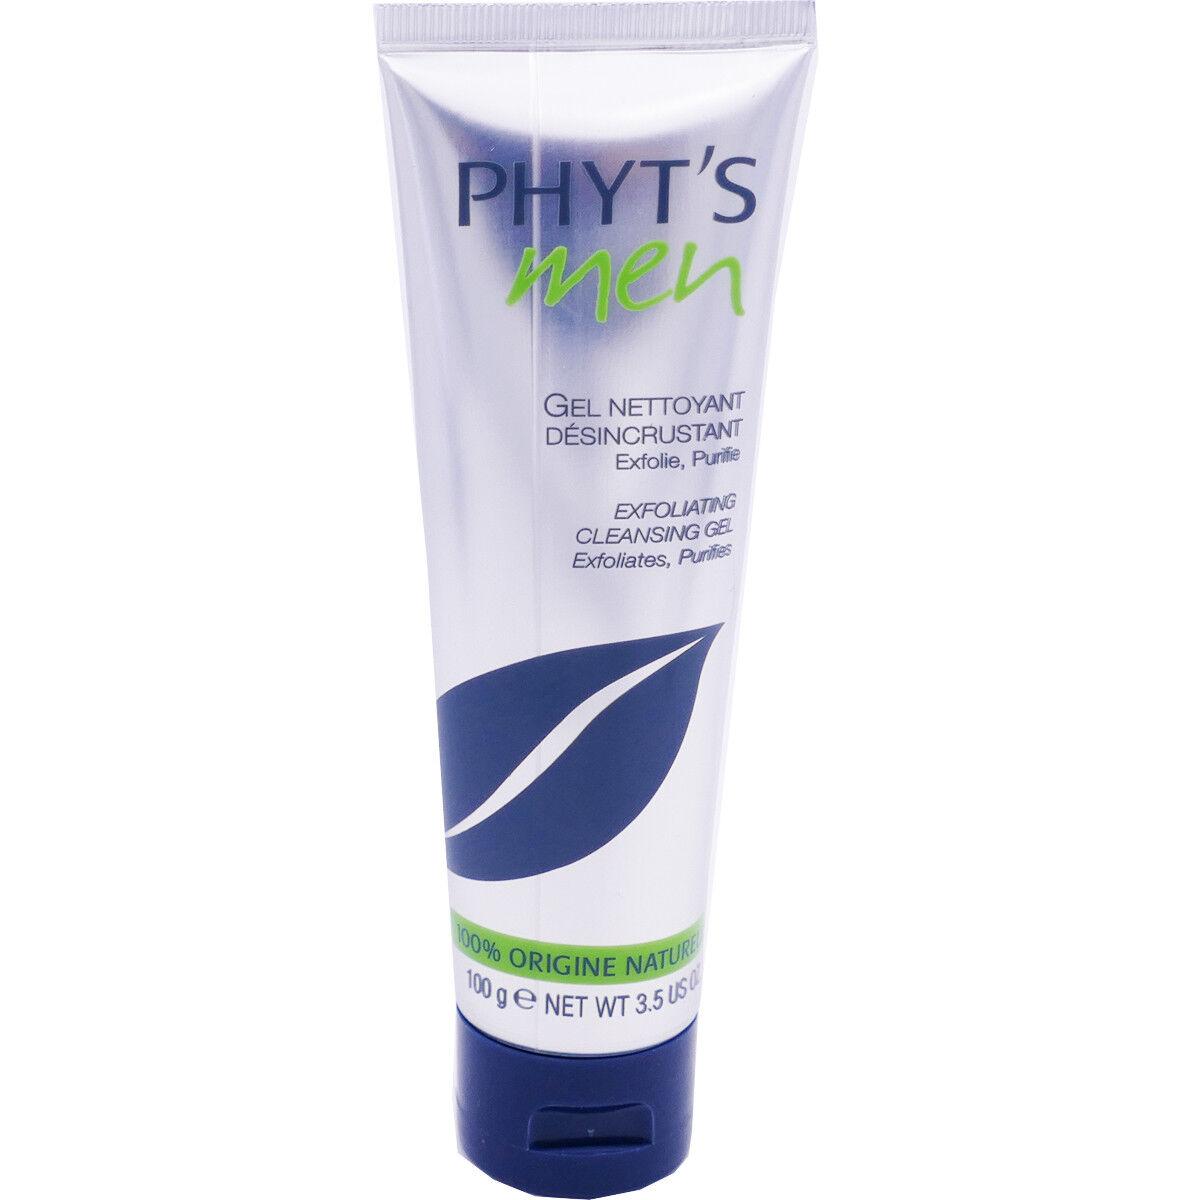 Phyt's men gel nettoyant dÉsincrustant 100 g